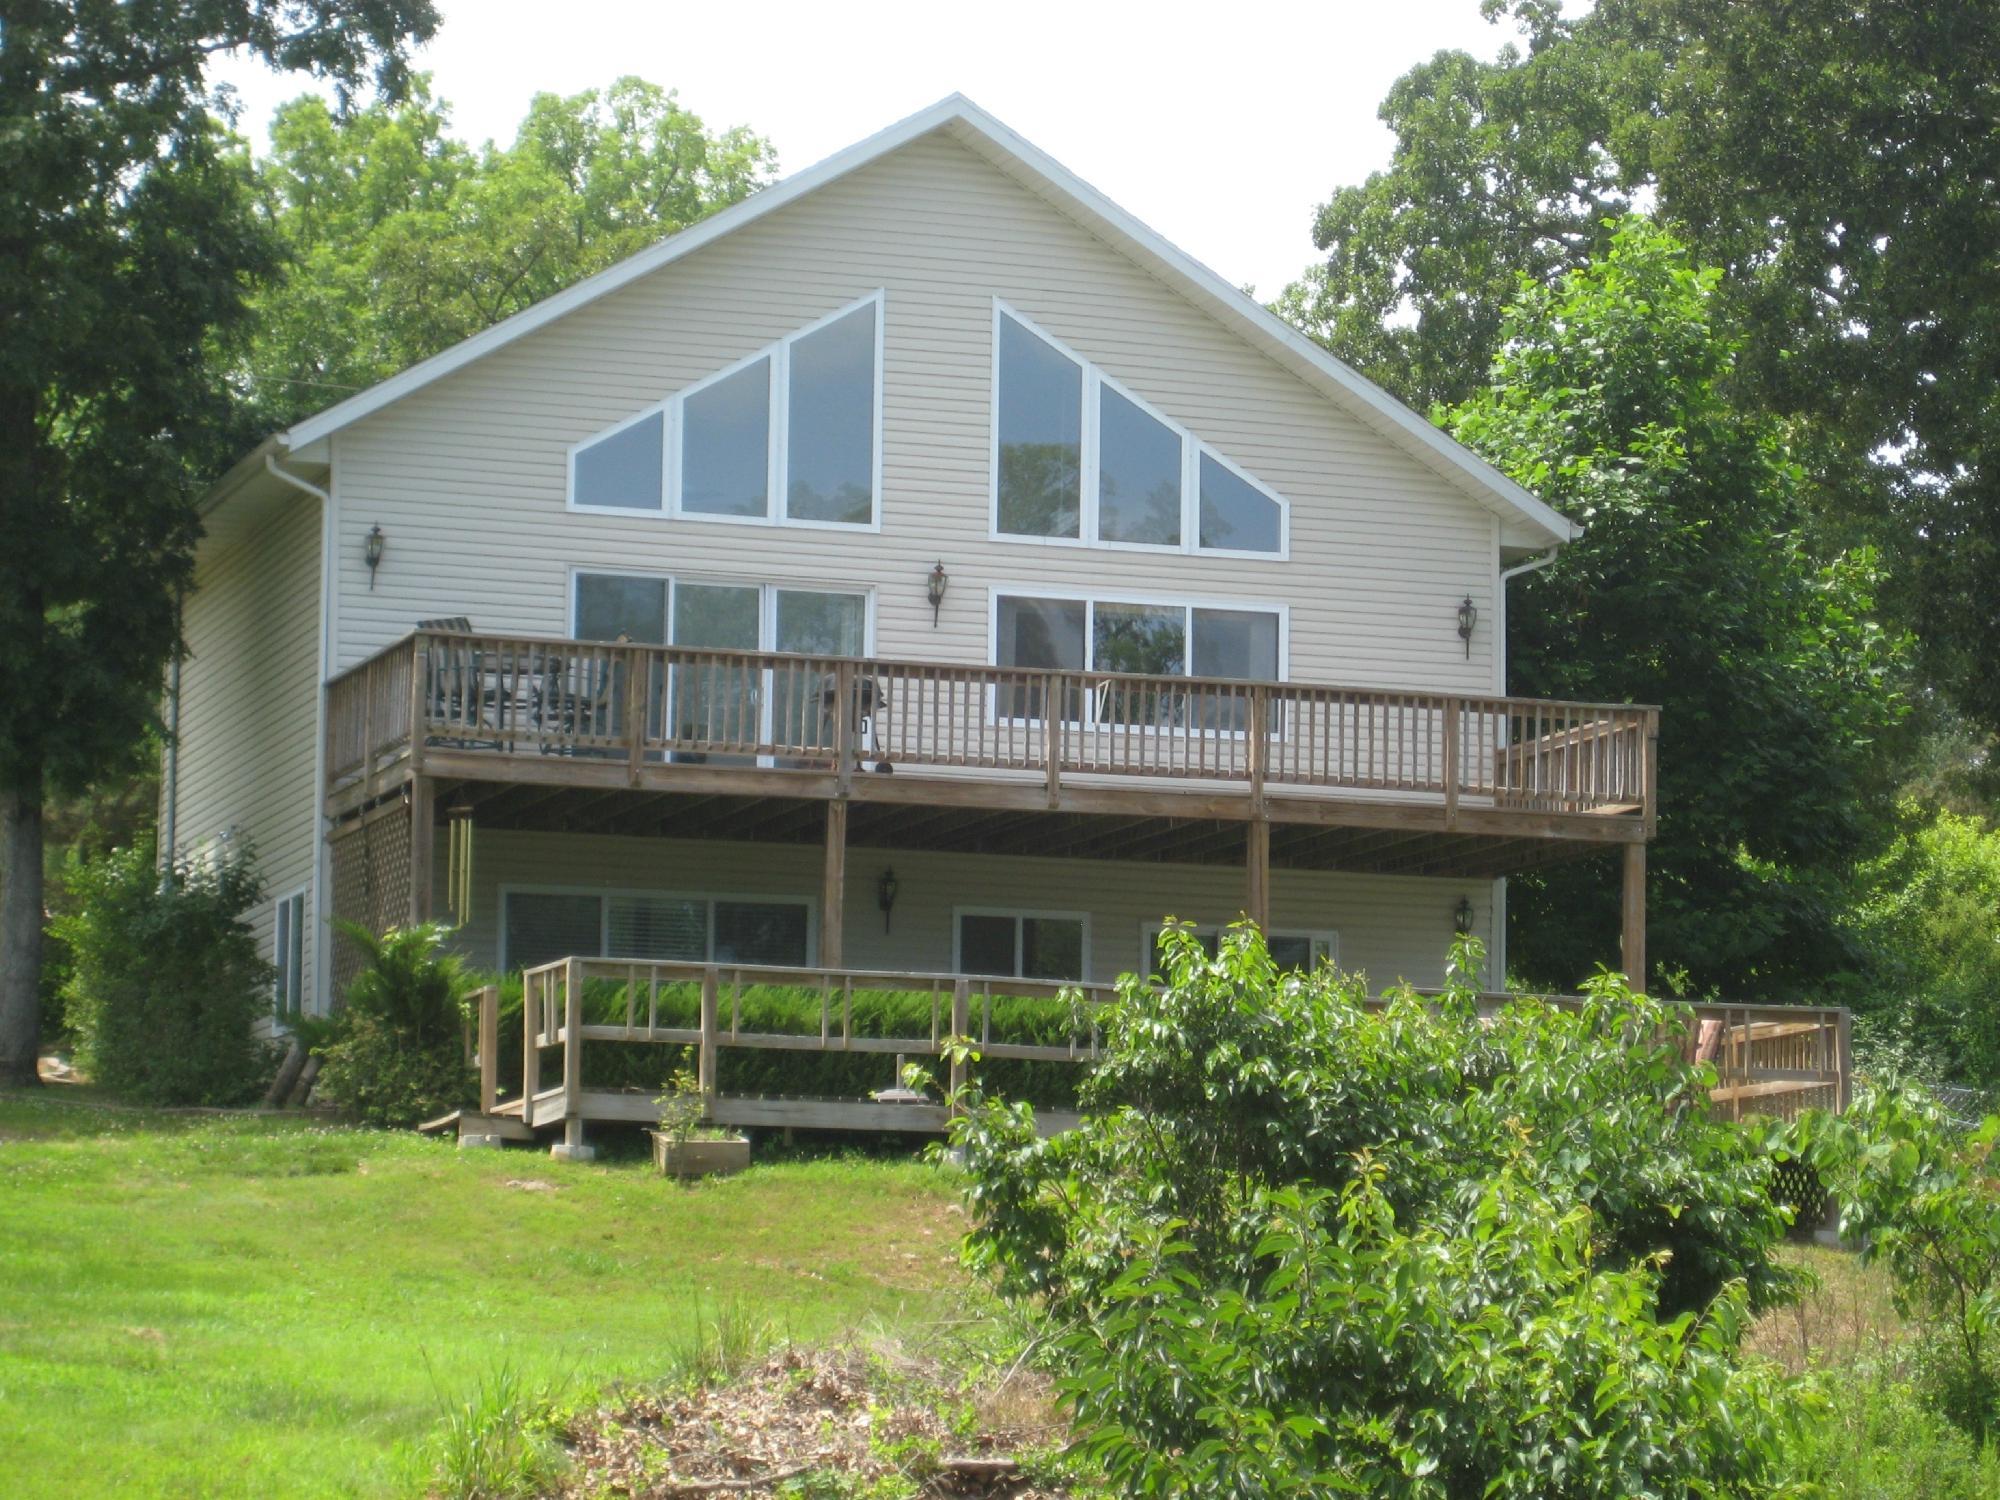 Eagle's Nest Resort & Vacation Properties